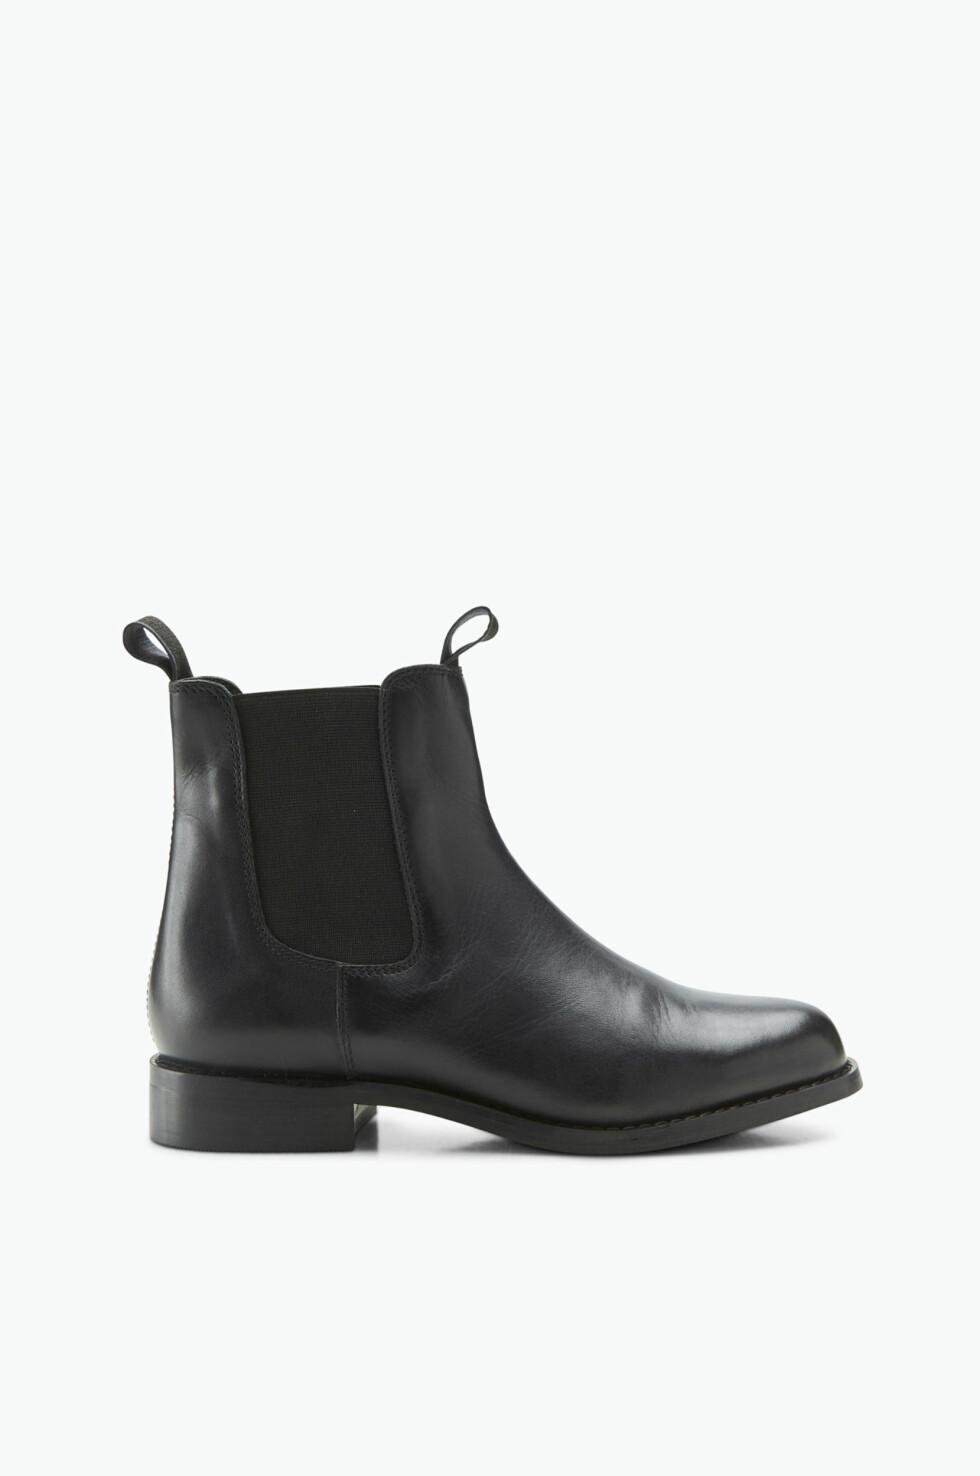 Boots fra Ellos   kr 1049   https://track.adtraction.com/t/t?a=1068408670&as=1115634940&t=2&tk=1&url=http://www.ellos.no/ellos-shoes/chelseaboots-tea-plain-leat/527559?selArt=606217&pr=0C1B2S3T